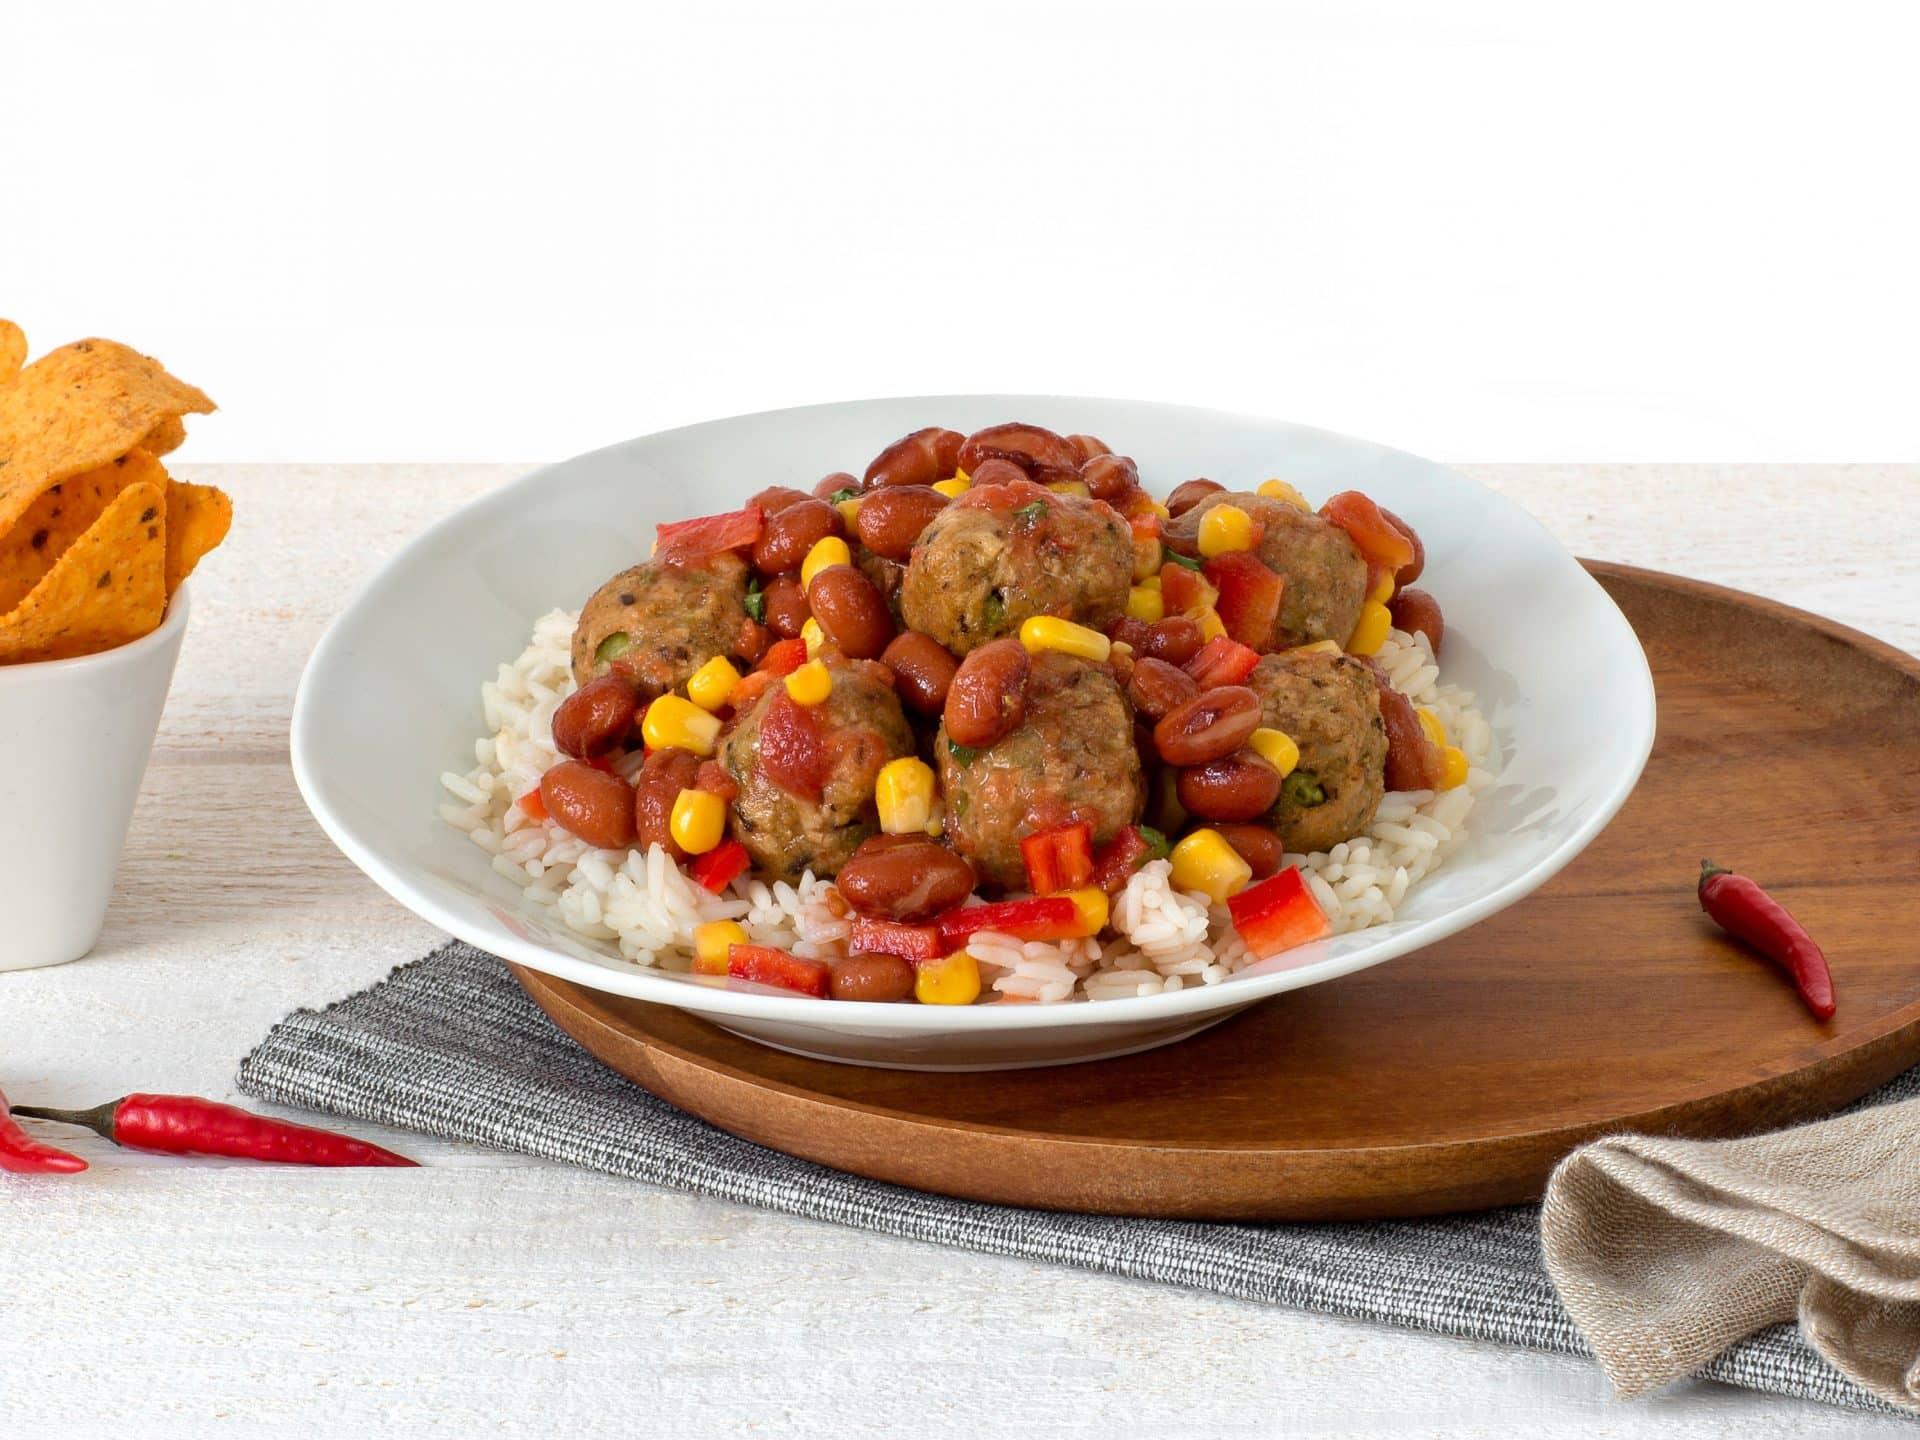 Meat substitute: Vegan Bean Ball Chili